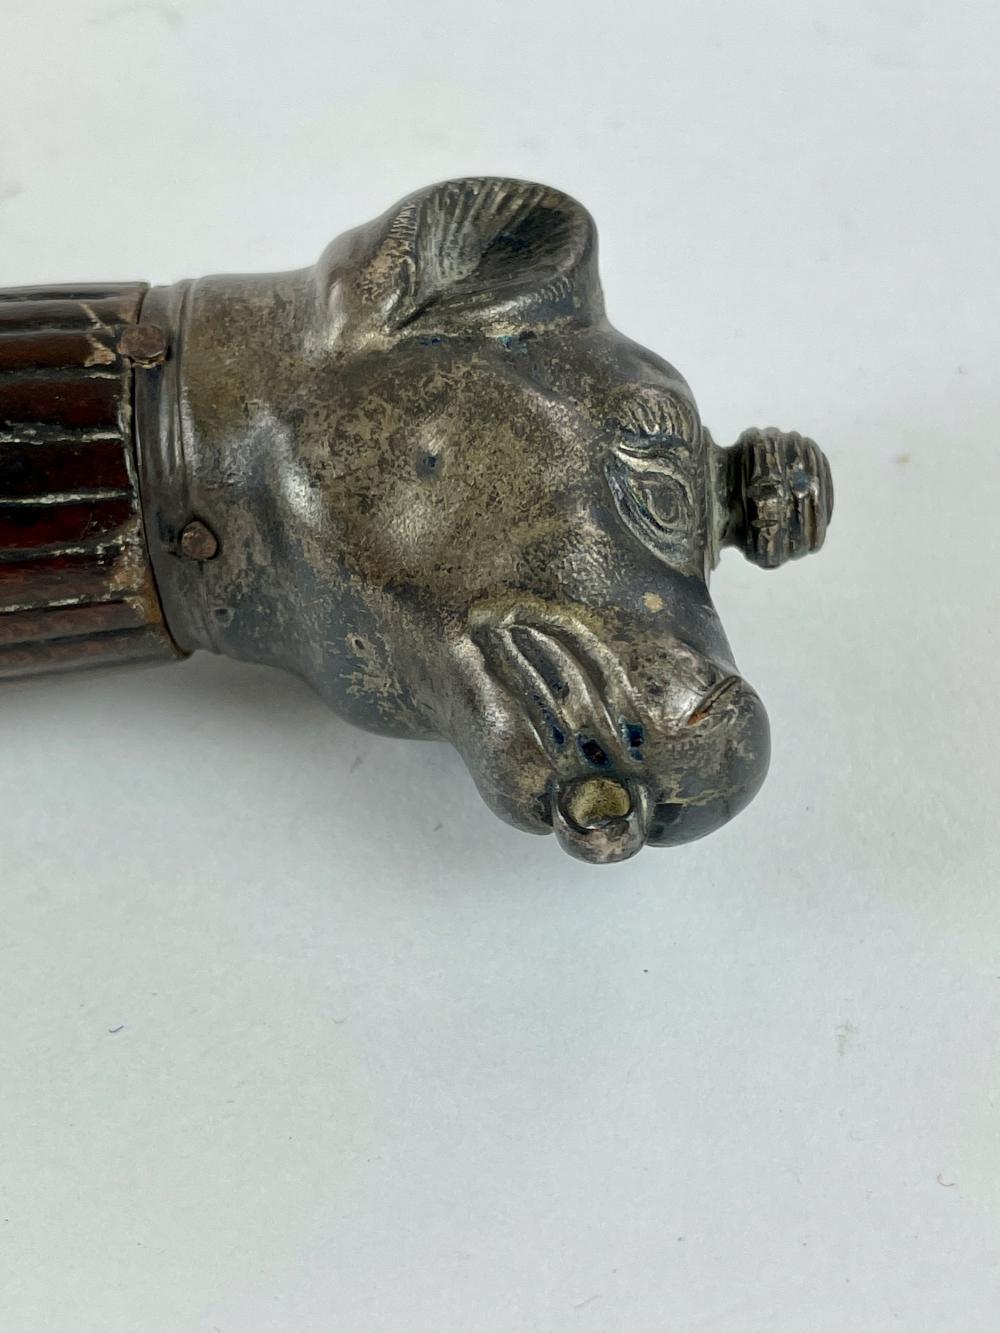 19th Century Sword with Dog Pommel